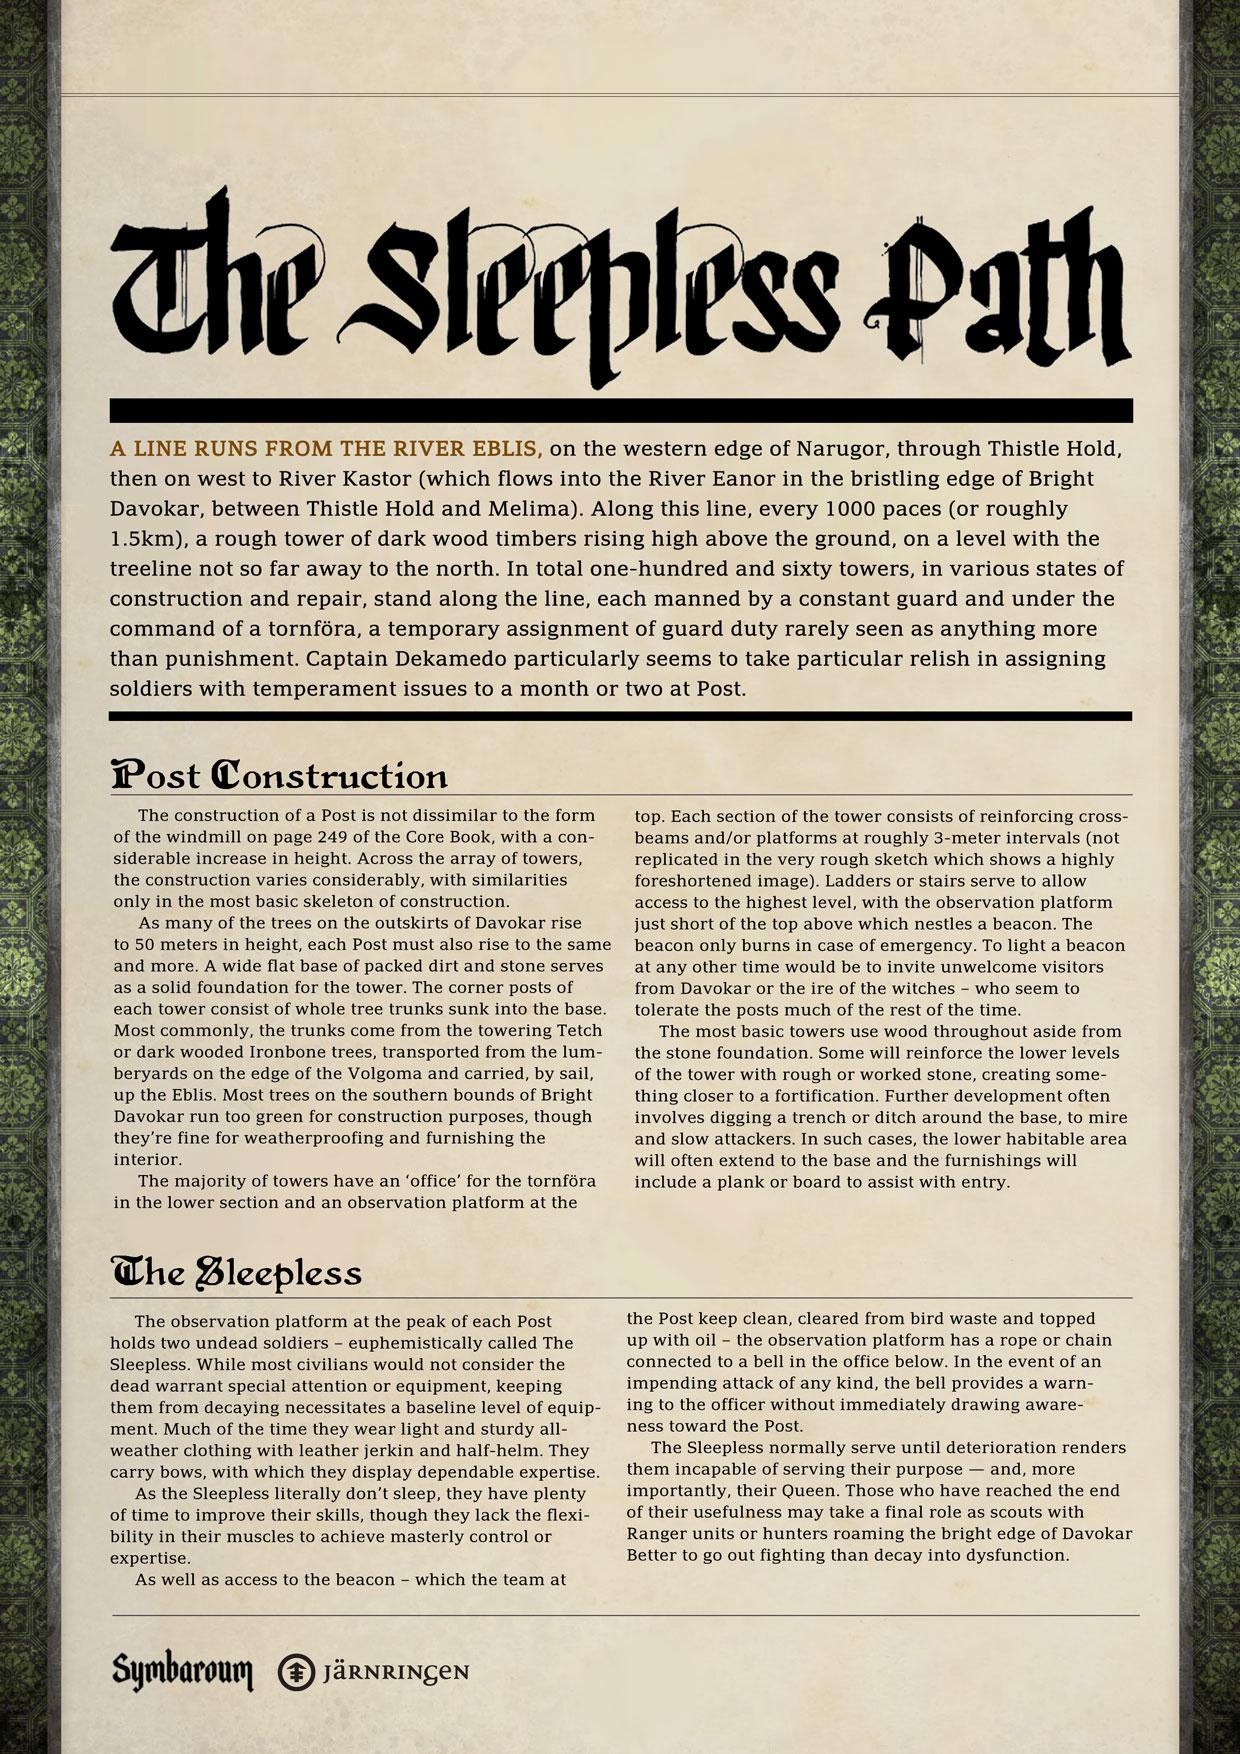 Symbaroum_-_Sleepless